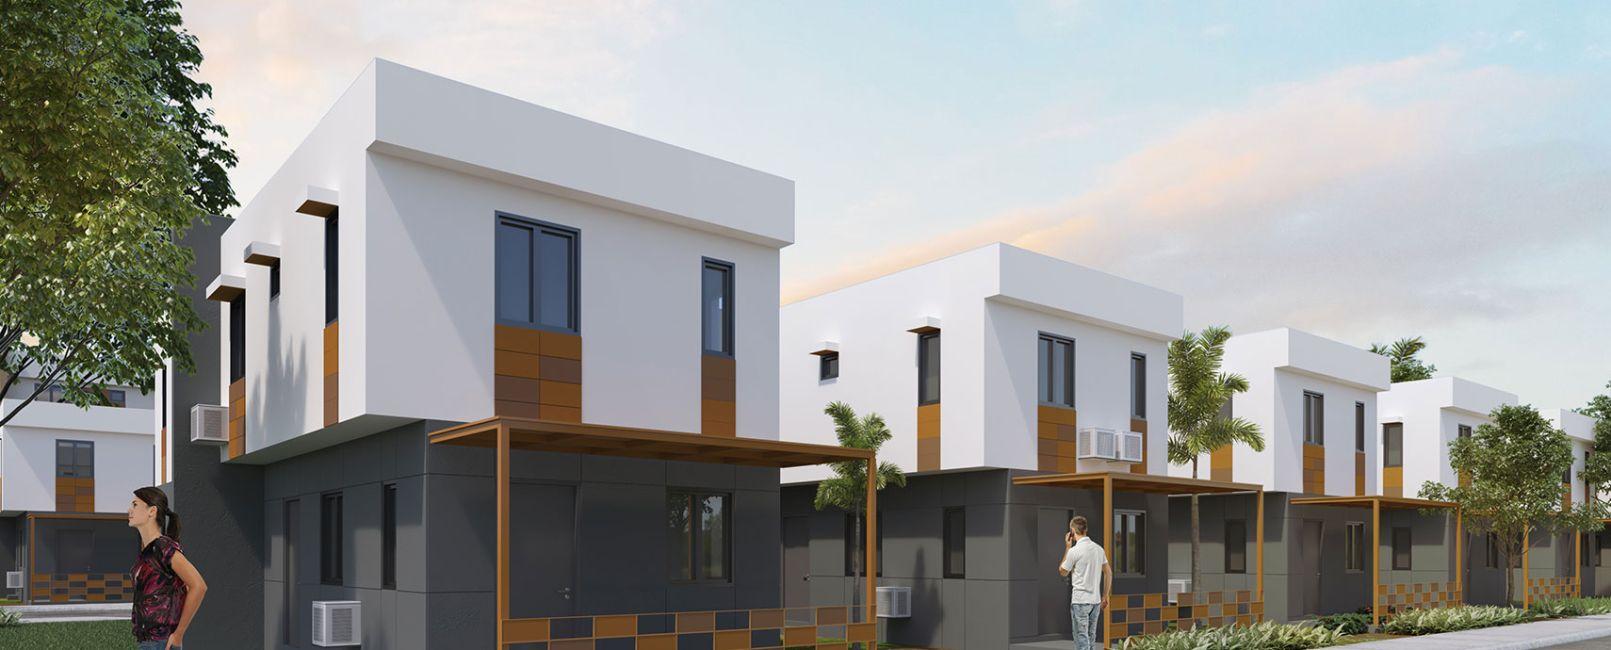 House and Lot Ajoya Capas in Capas